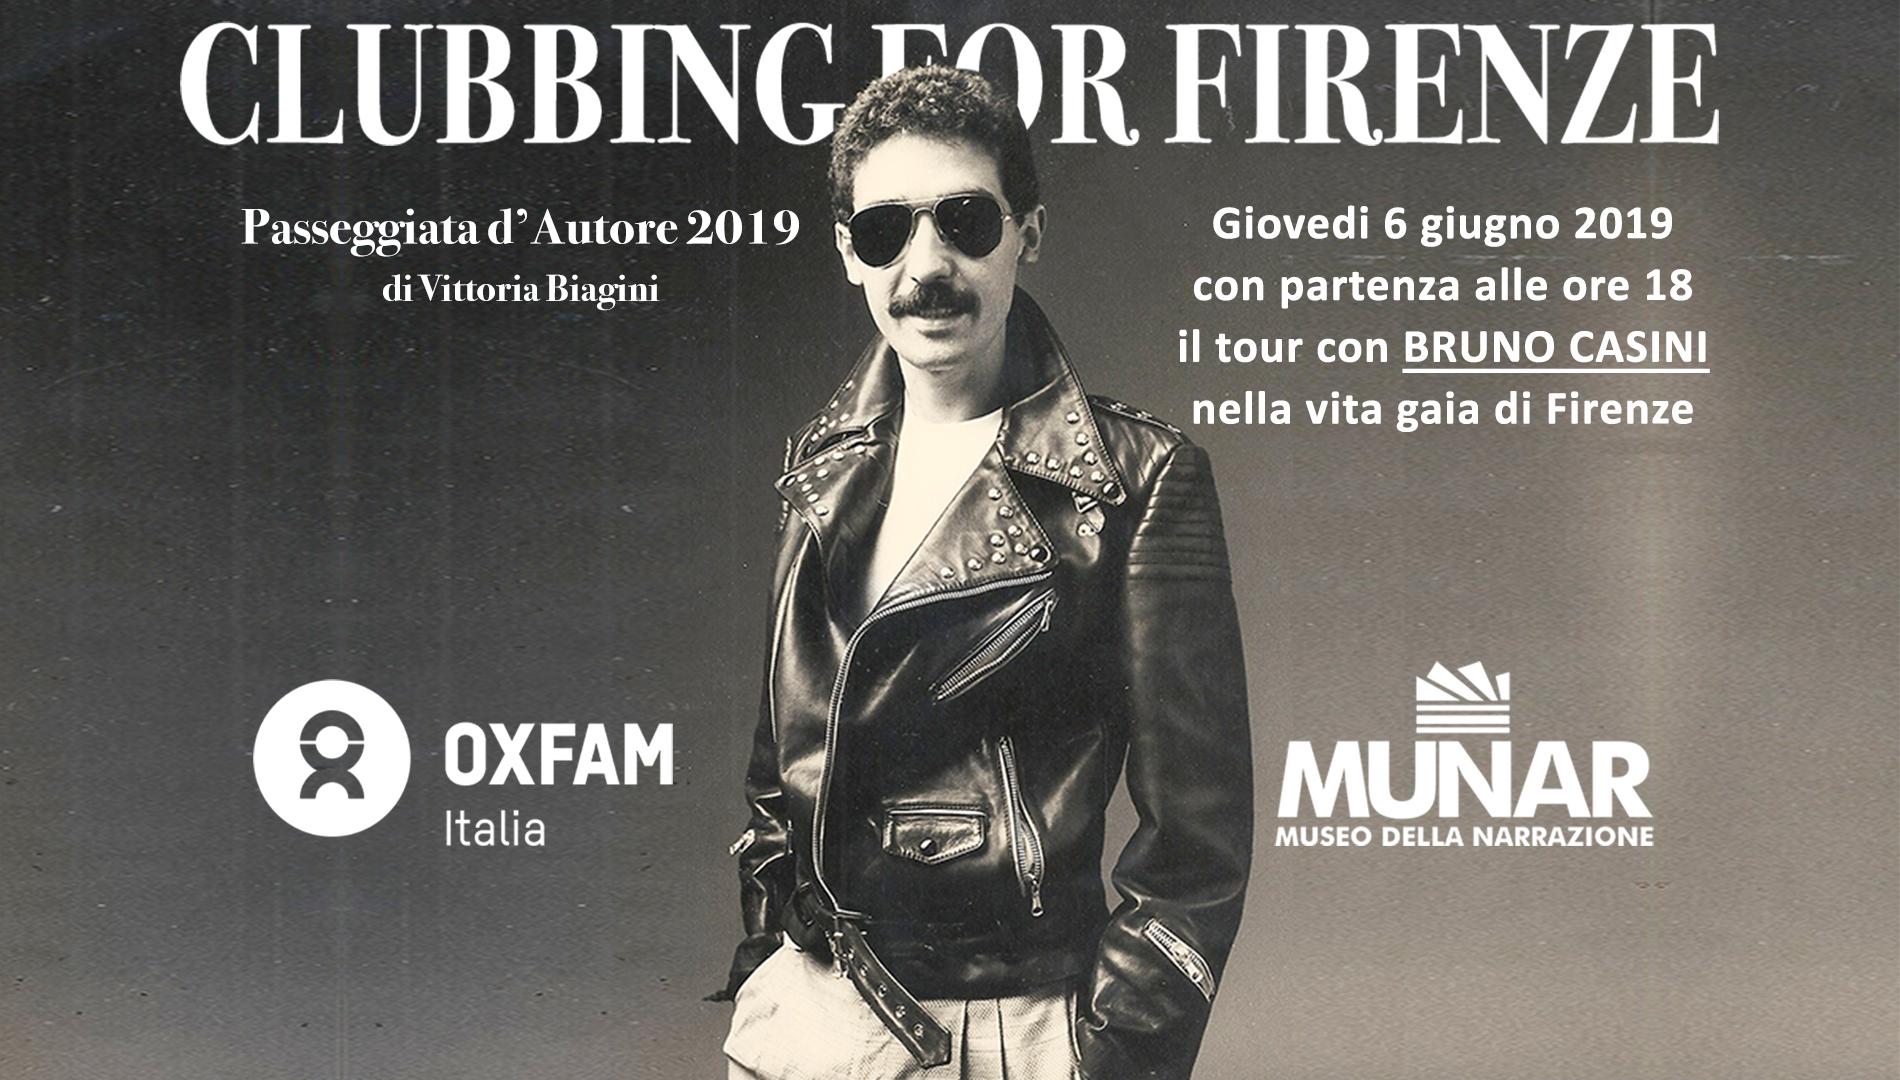 Clubbing_for_Firenze_eventoFB